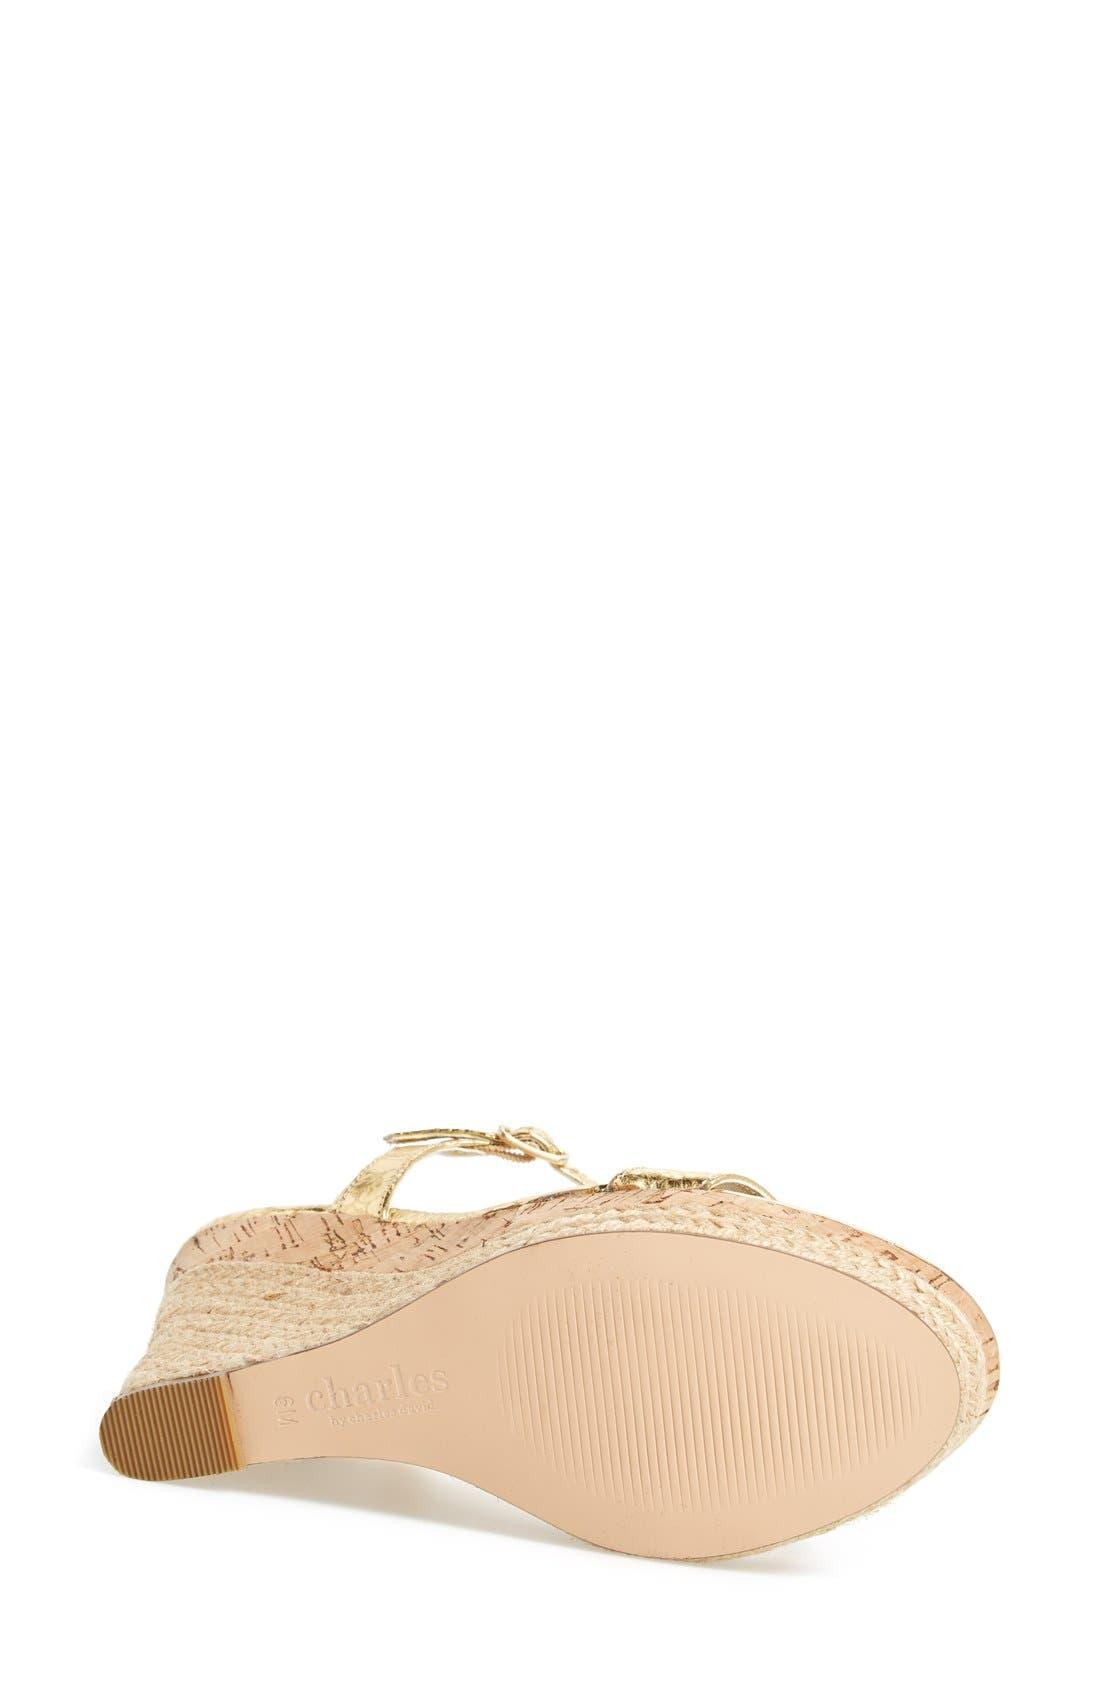 ,                             'Alabama' Espadrille Wedge Sandal,                             Alternate thumbnail 16, color,                             711